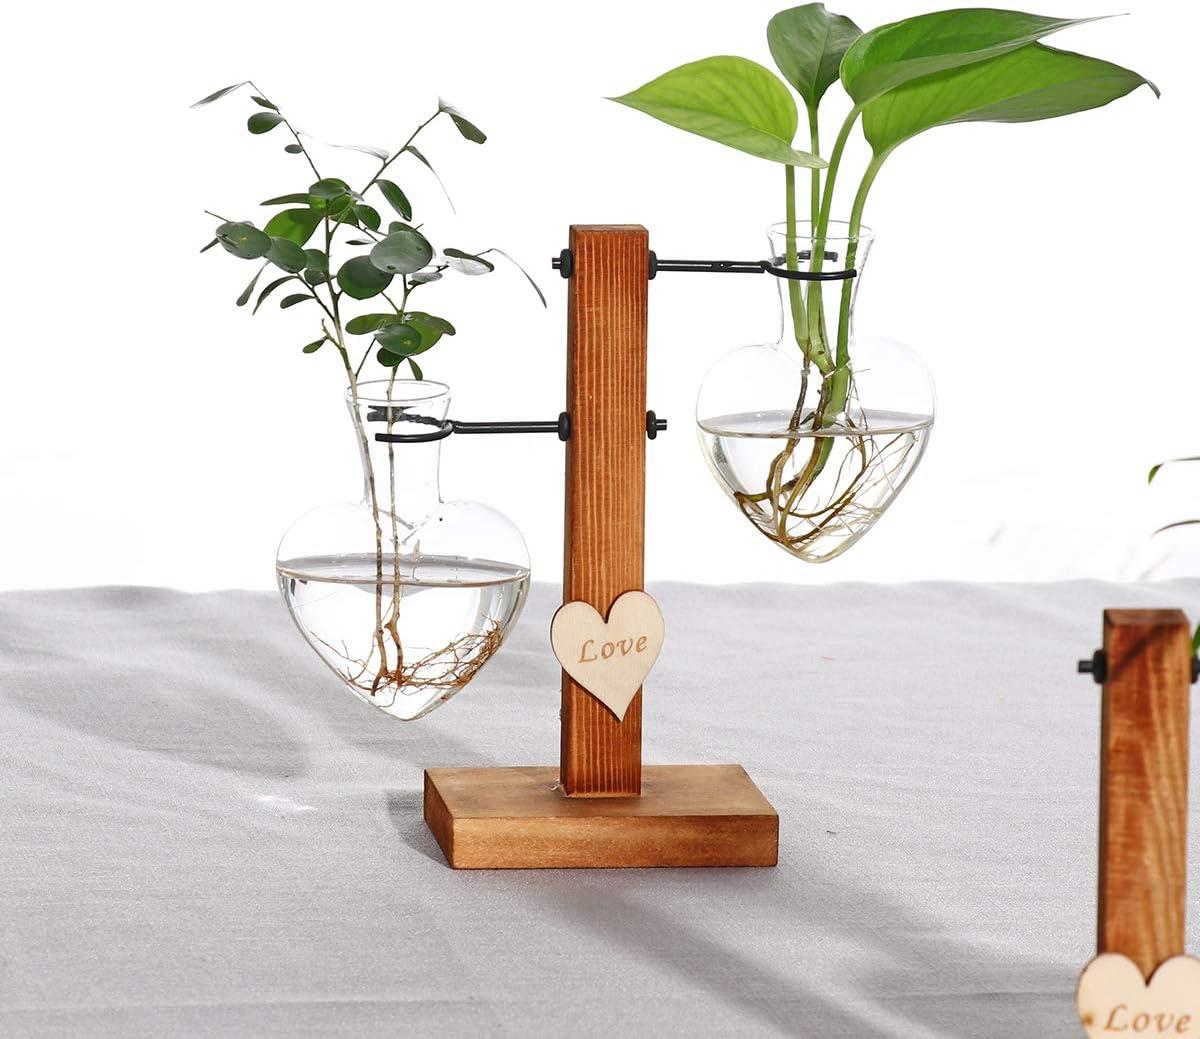 Kingbuy Hydroponic Glass Vase Vintage Desktop Plant Terrarium Planter Bulb Vase Water Planting Propagation Vase Libra planters Hydroponics Plants with Retro Wooden Stand Home Garden. (E(2 Bulb Vase))